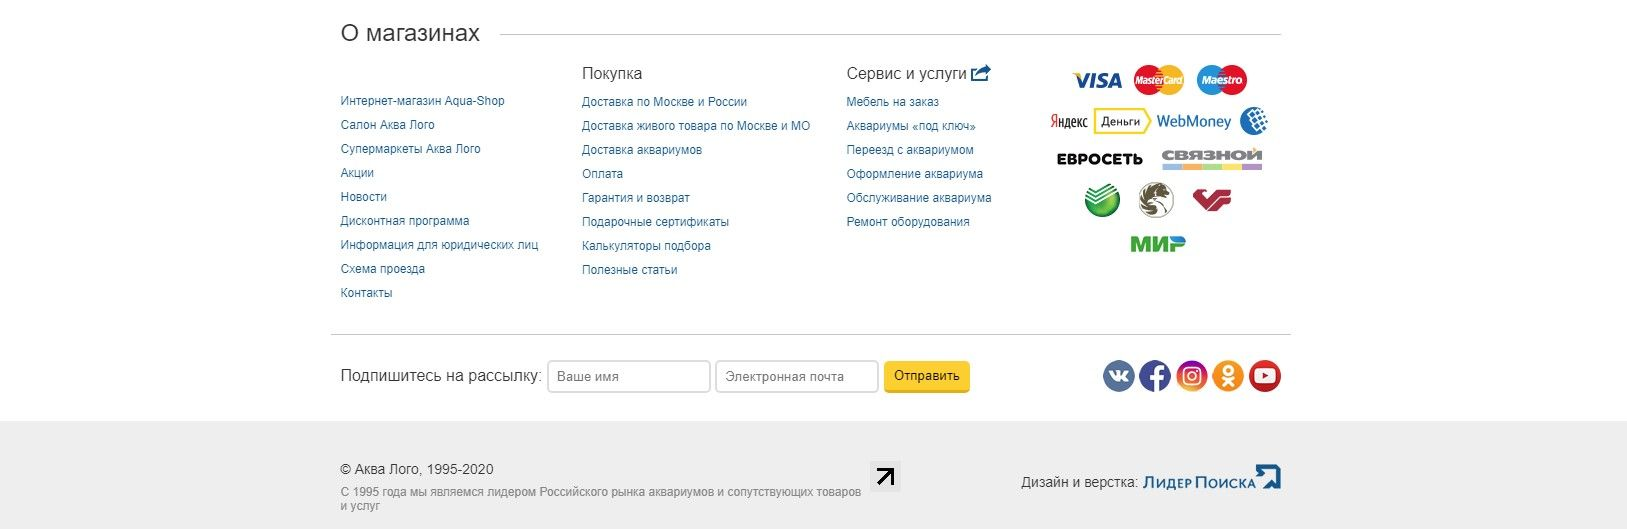 Бэклинк в футере на примере www.aqua-shop.ru